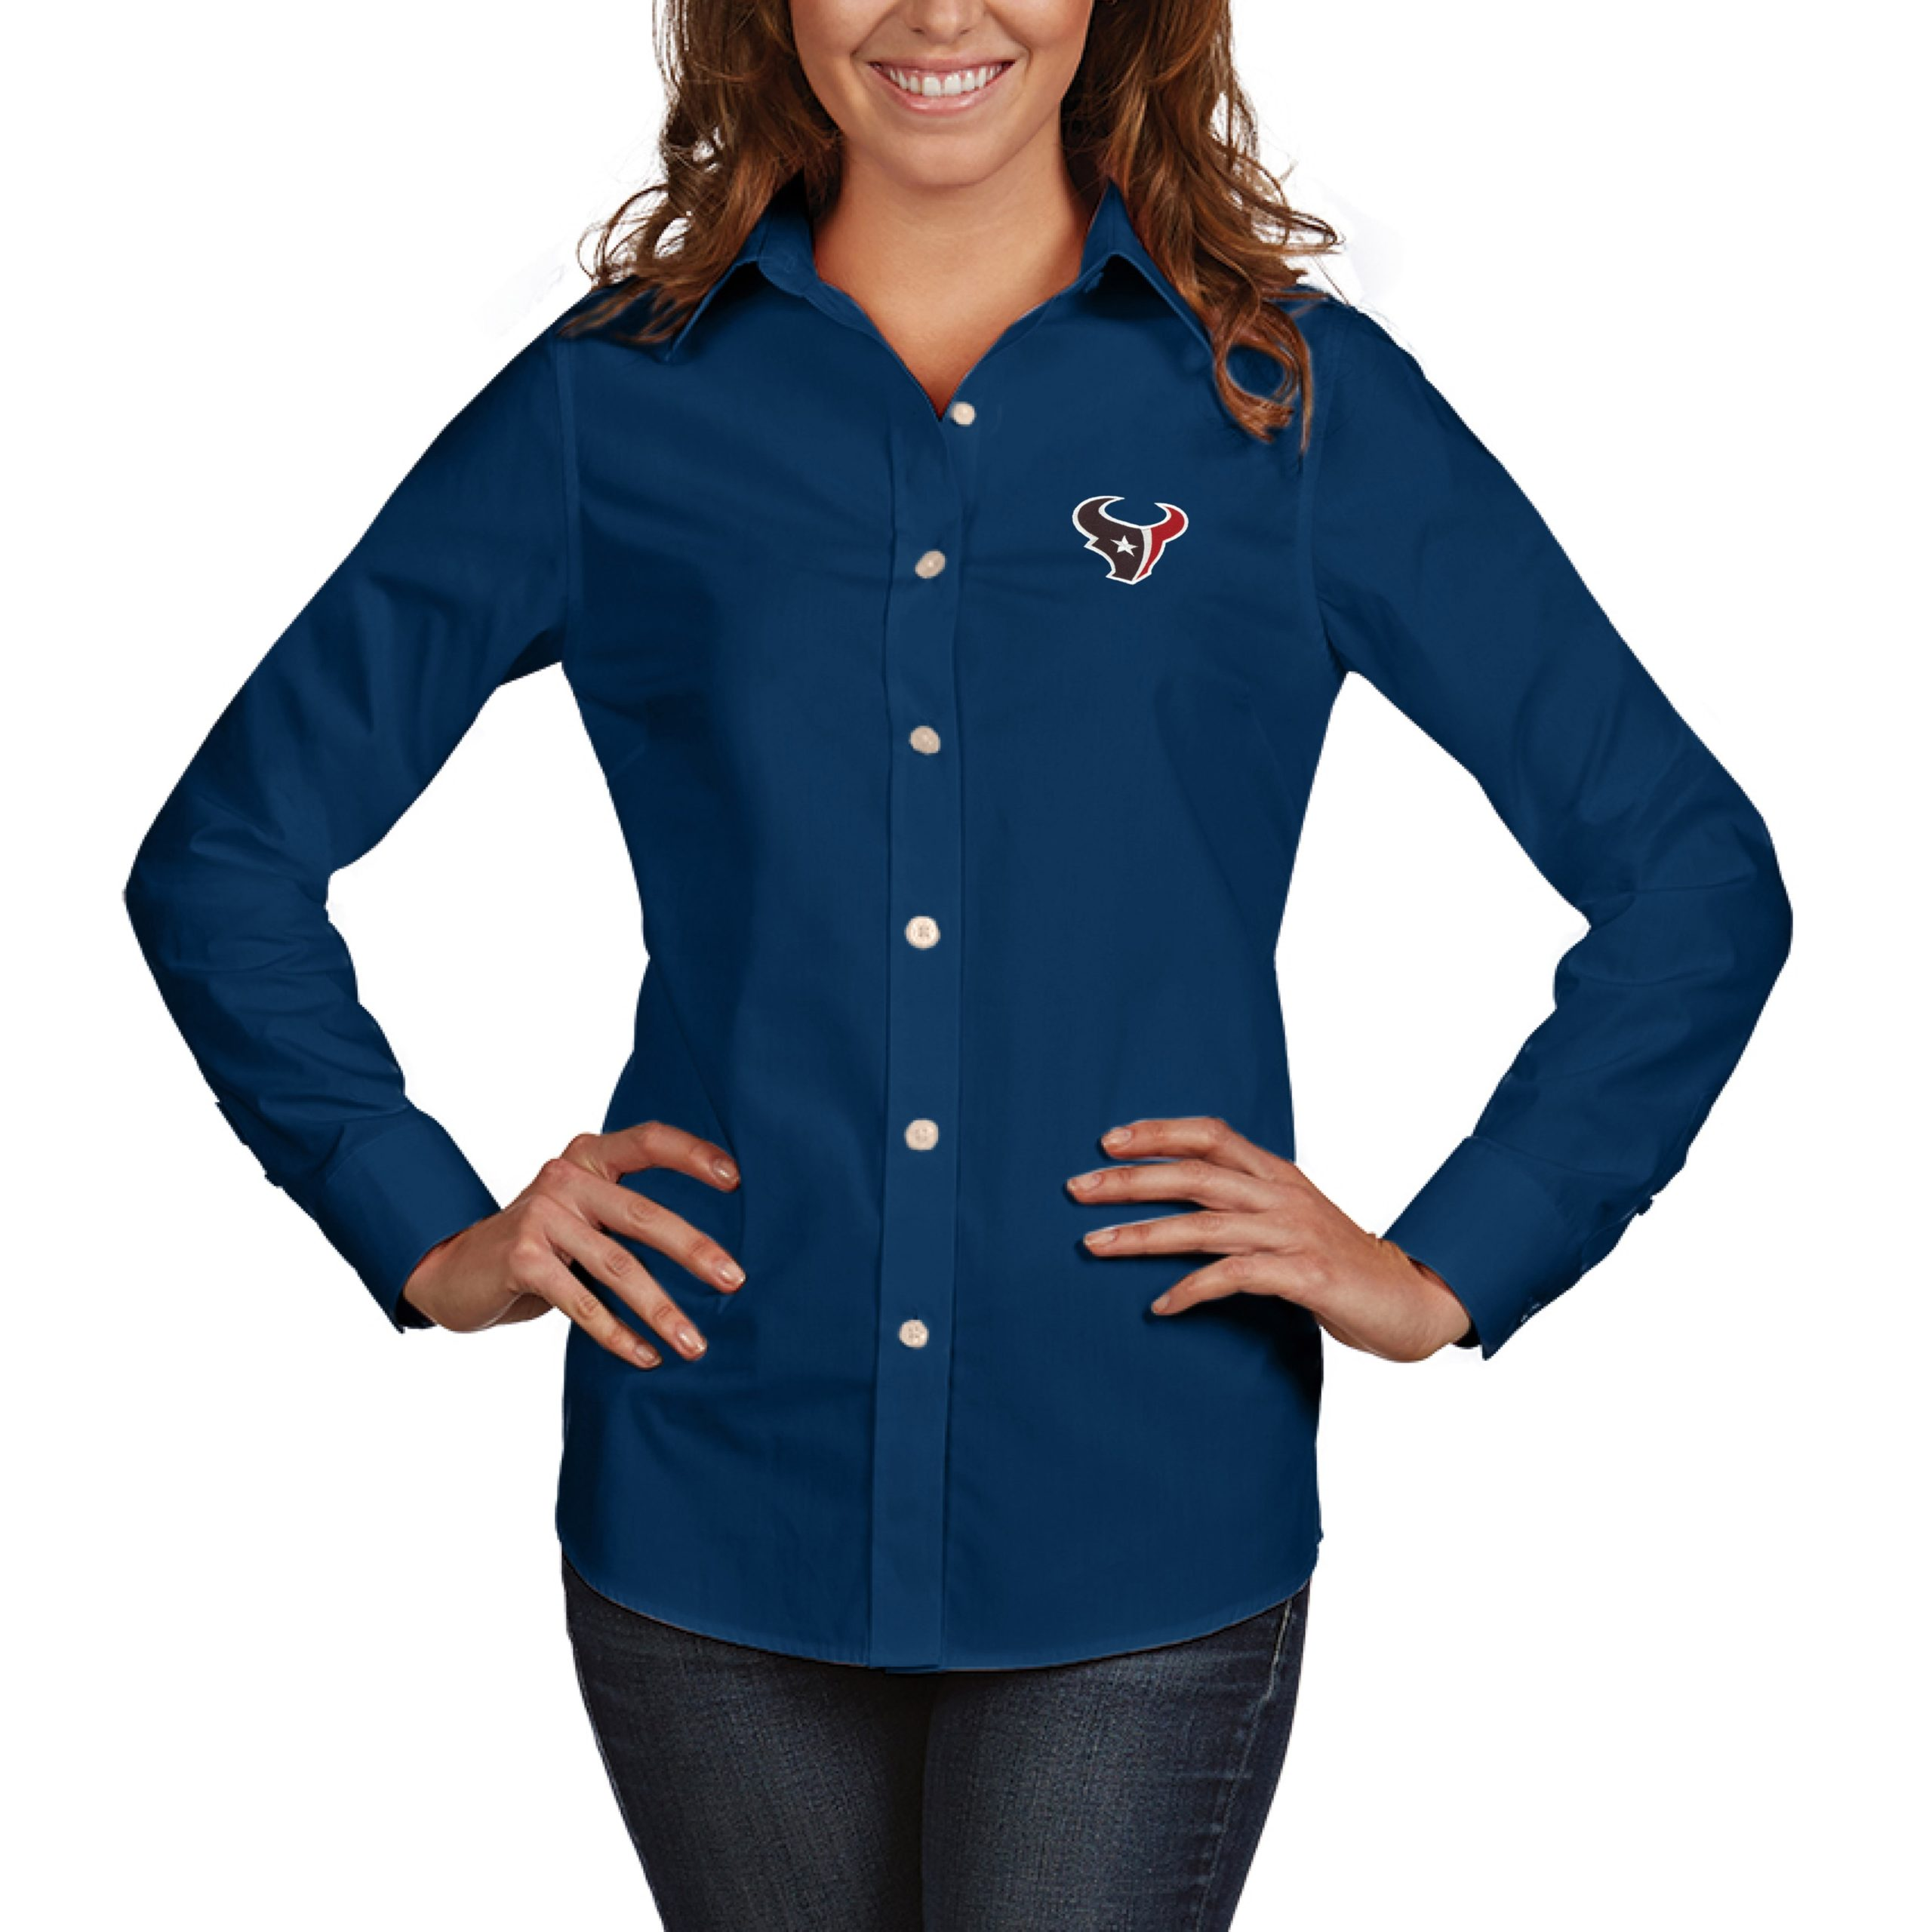 Houston Texans Antigua Women's Dynasty Woven Button Up Long Sleeve Shirt - Navy